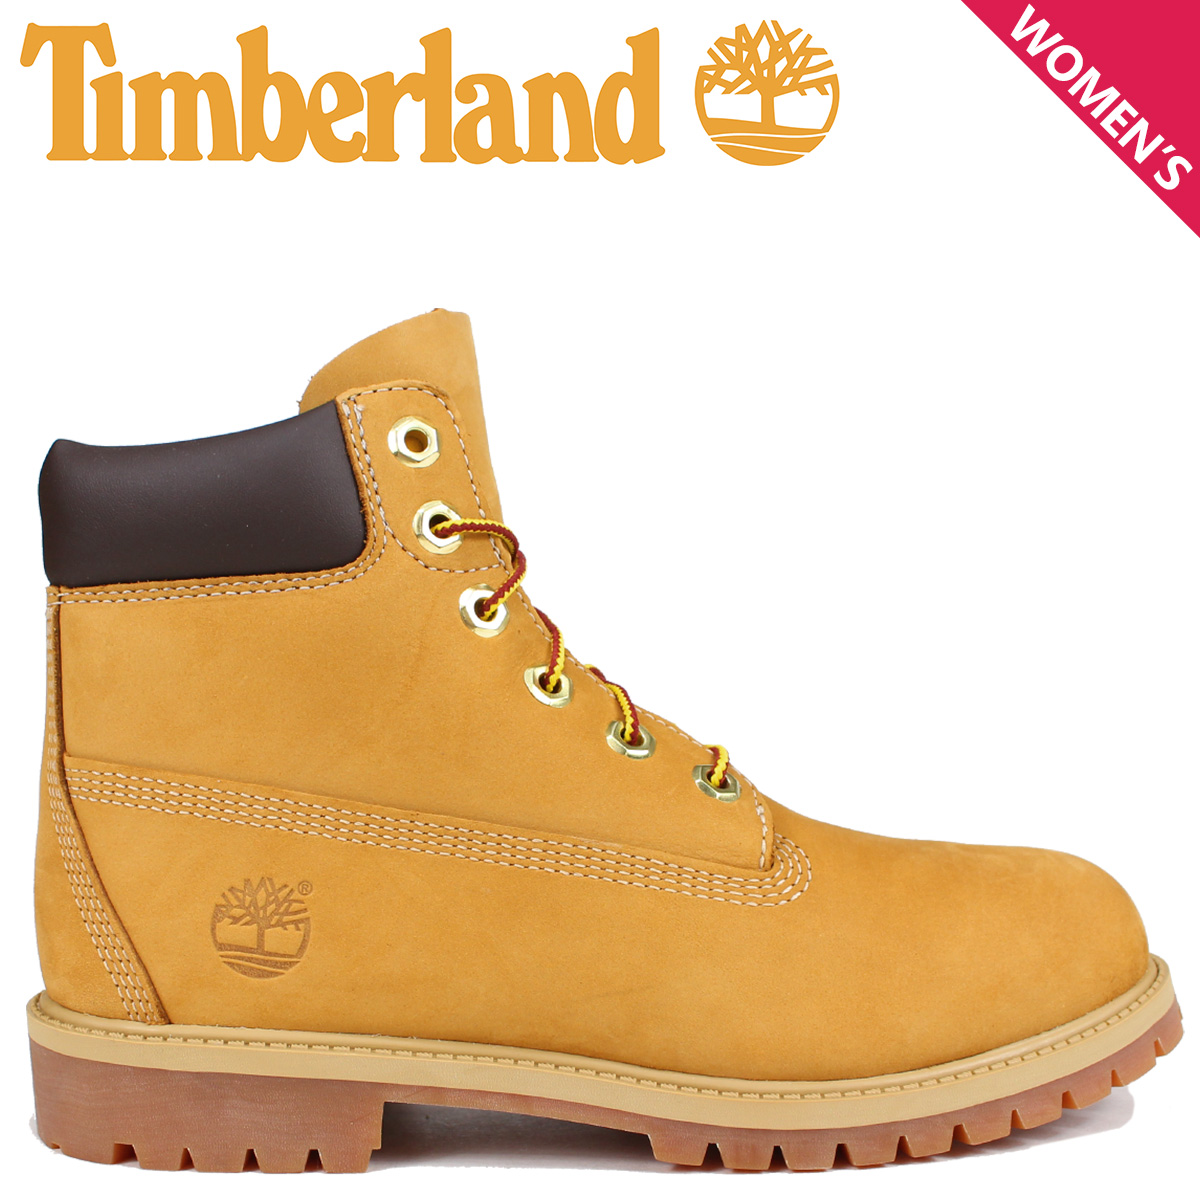 Sugar Online Shop: Timberland Timberland 6 inch premium boots 12909 ...